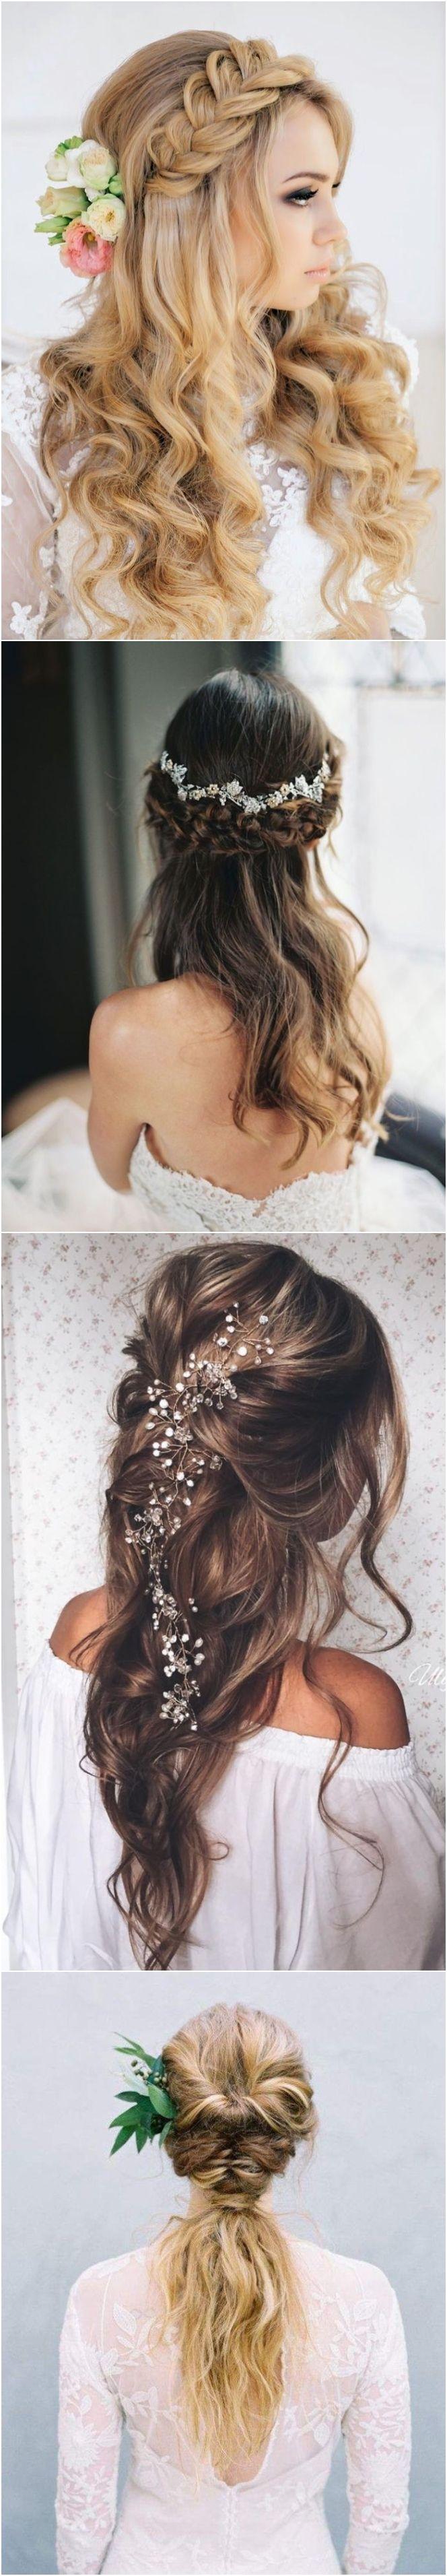 Best Hair Style For Bride   : 40 Stunning Half Up Half Down Wedding Hairstyles with Tutorial / www.deerpearlfl…